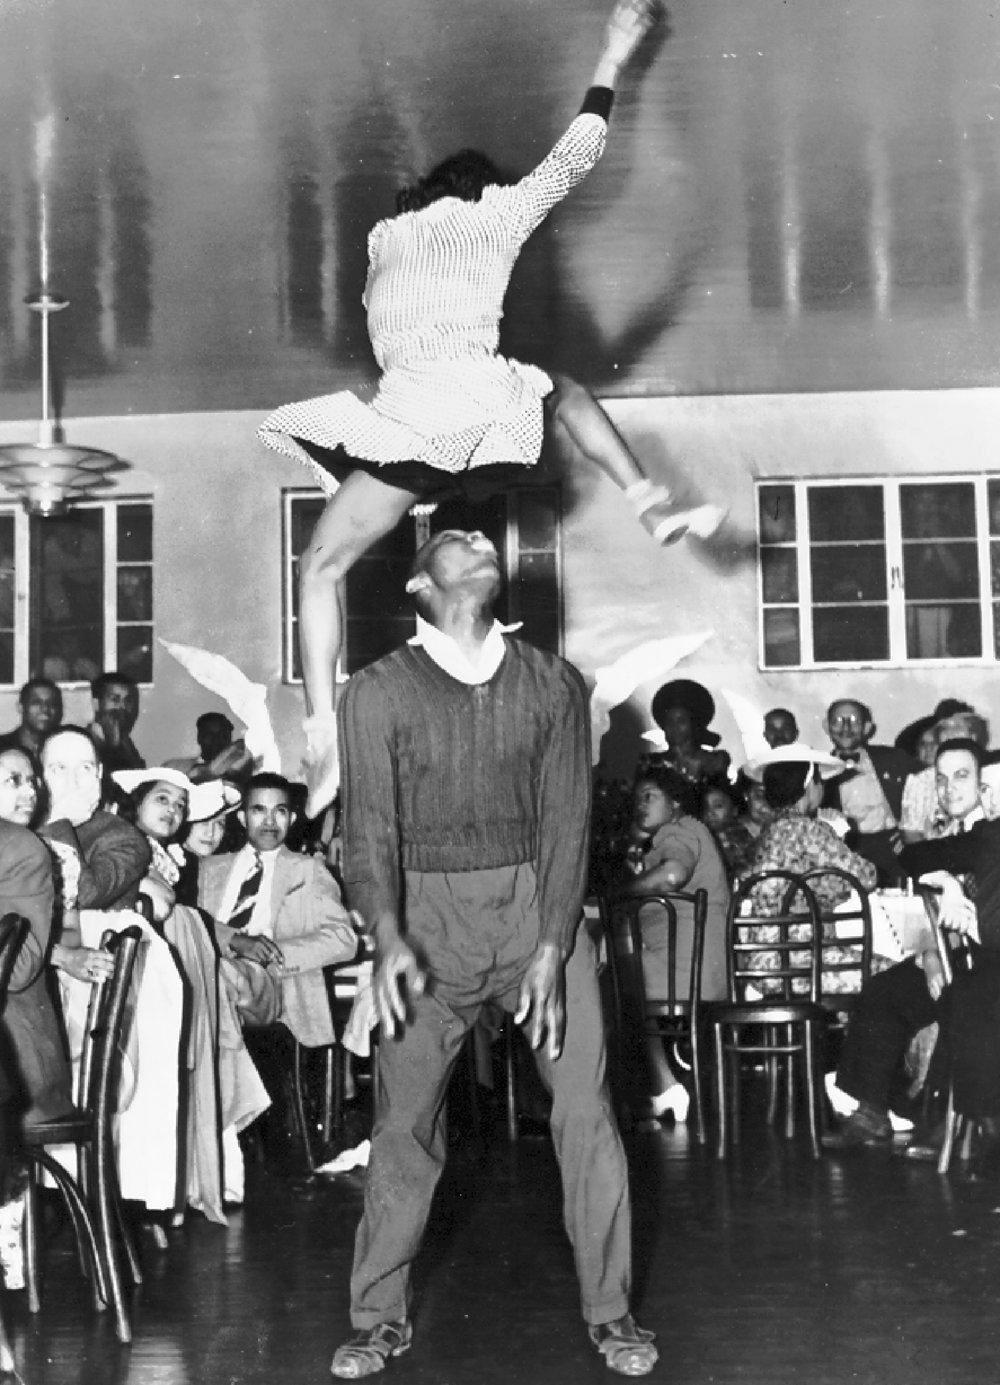 Ann Johnson and Frankie Manning, 1941